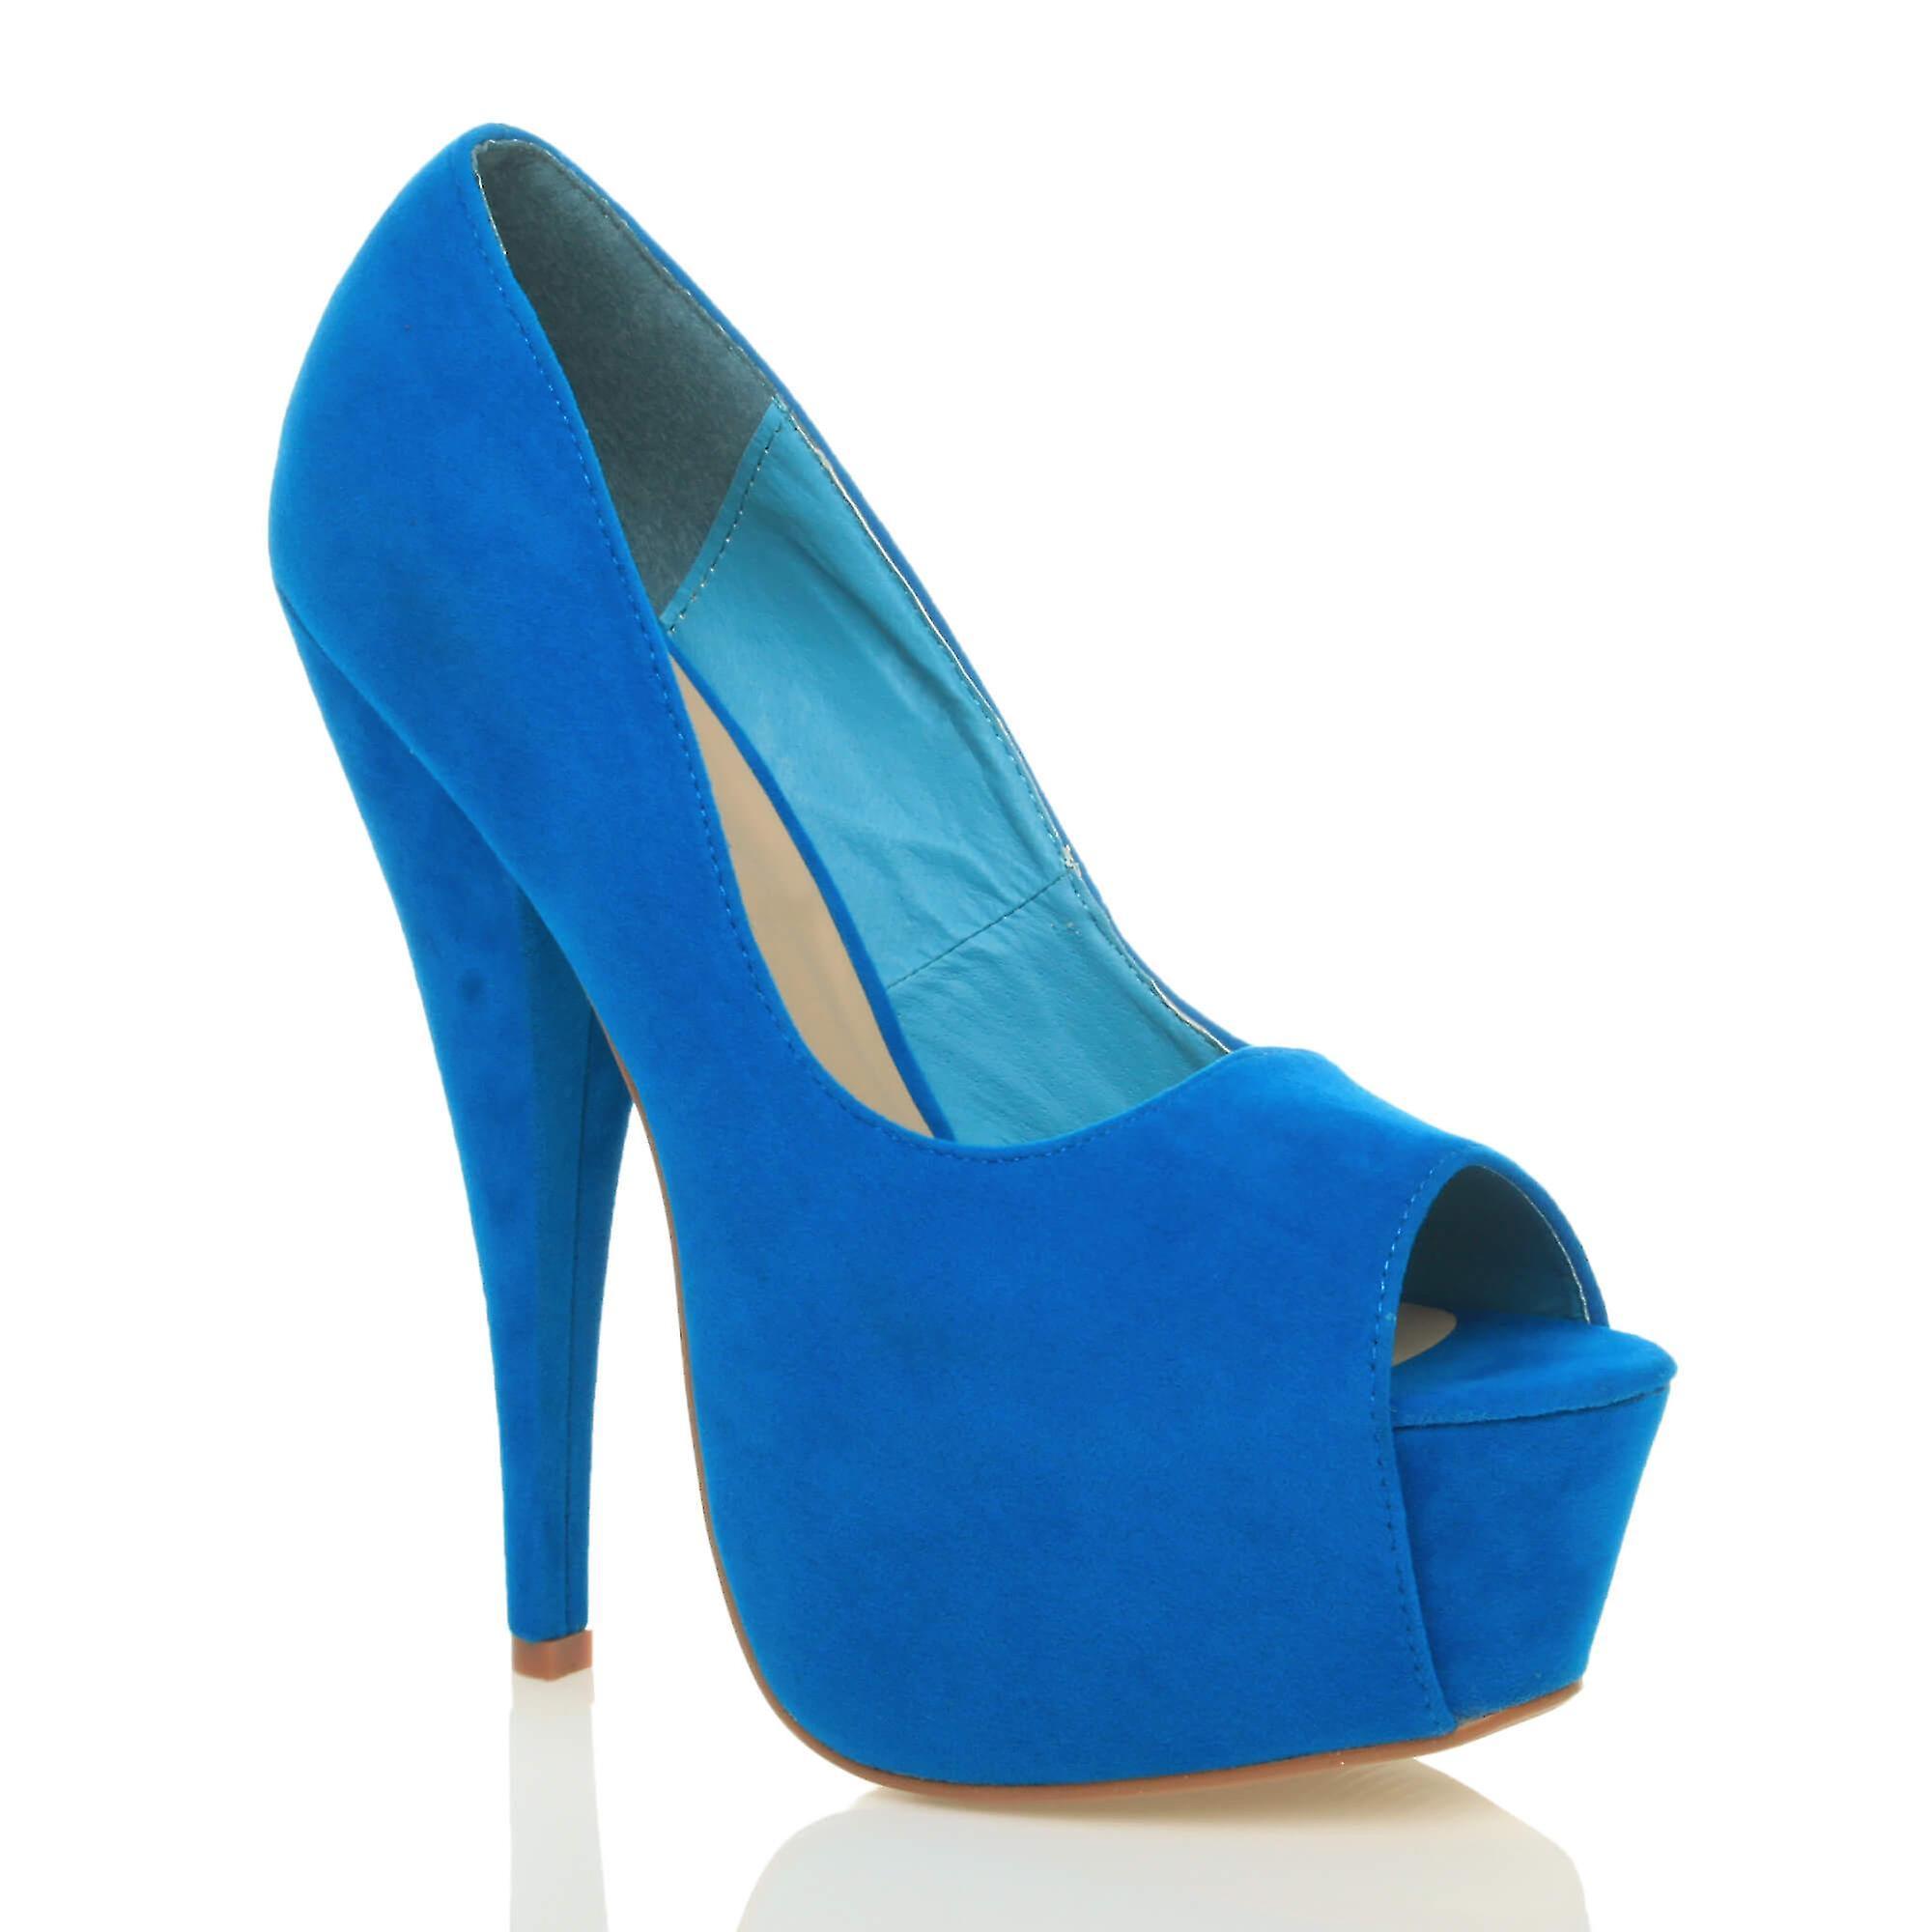 Ajvani Damen high Heels klassischen Party Abend Peep Toe Gericht Schuhe Sandalen